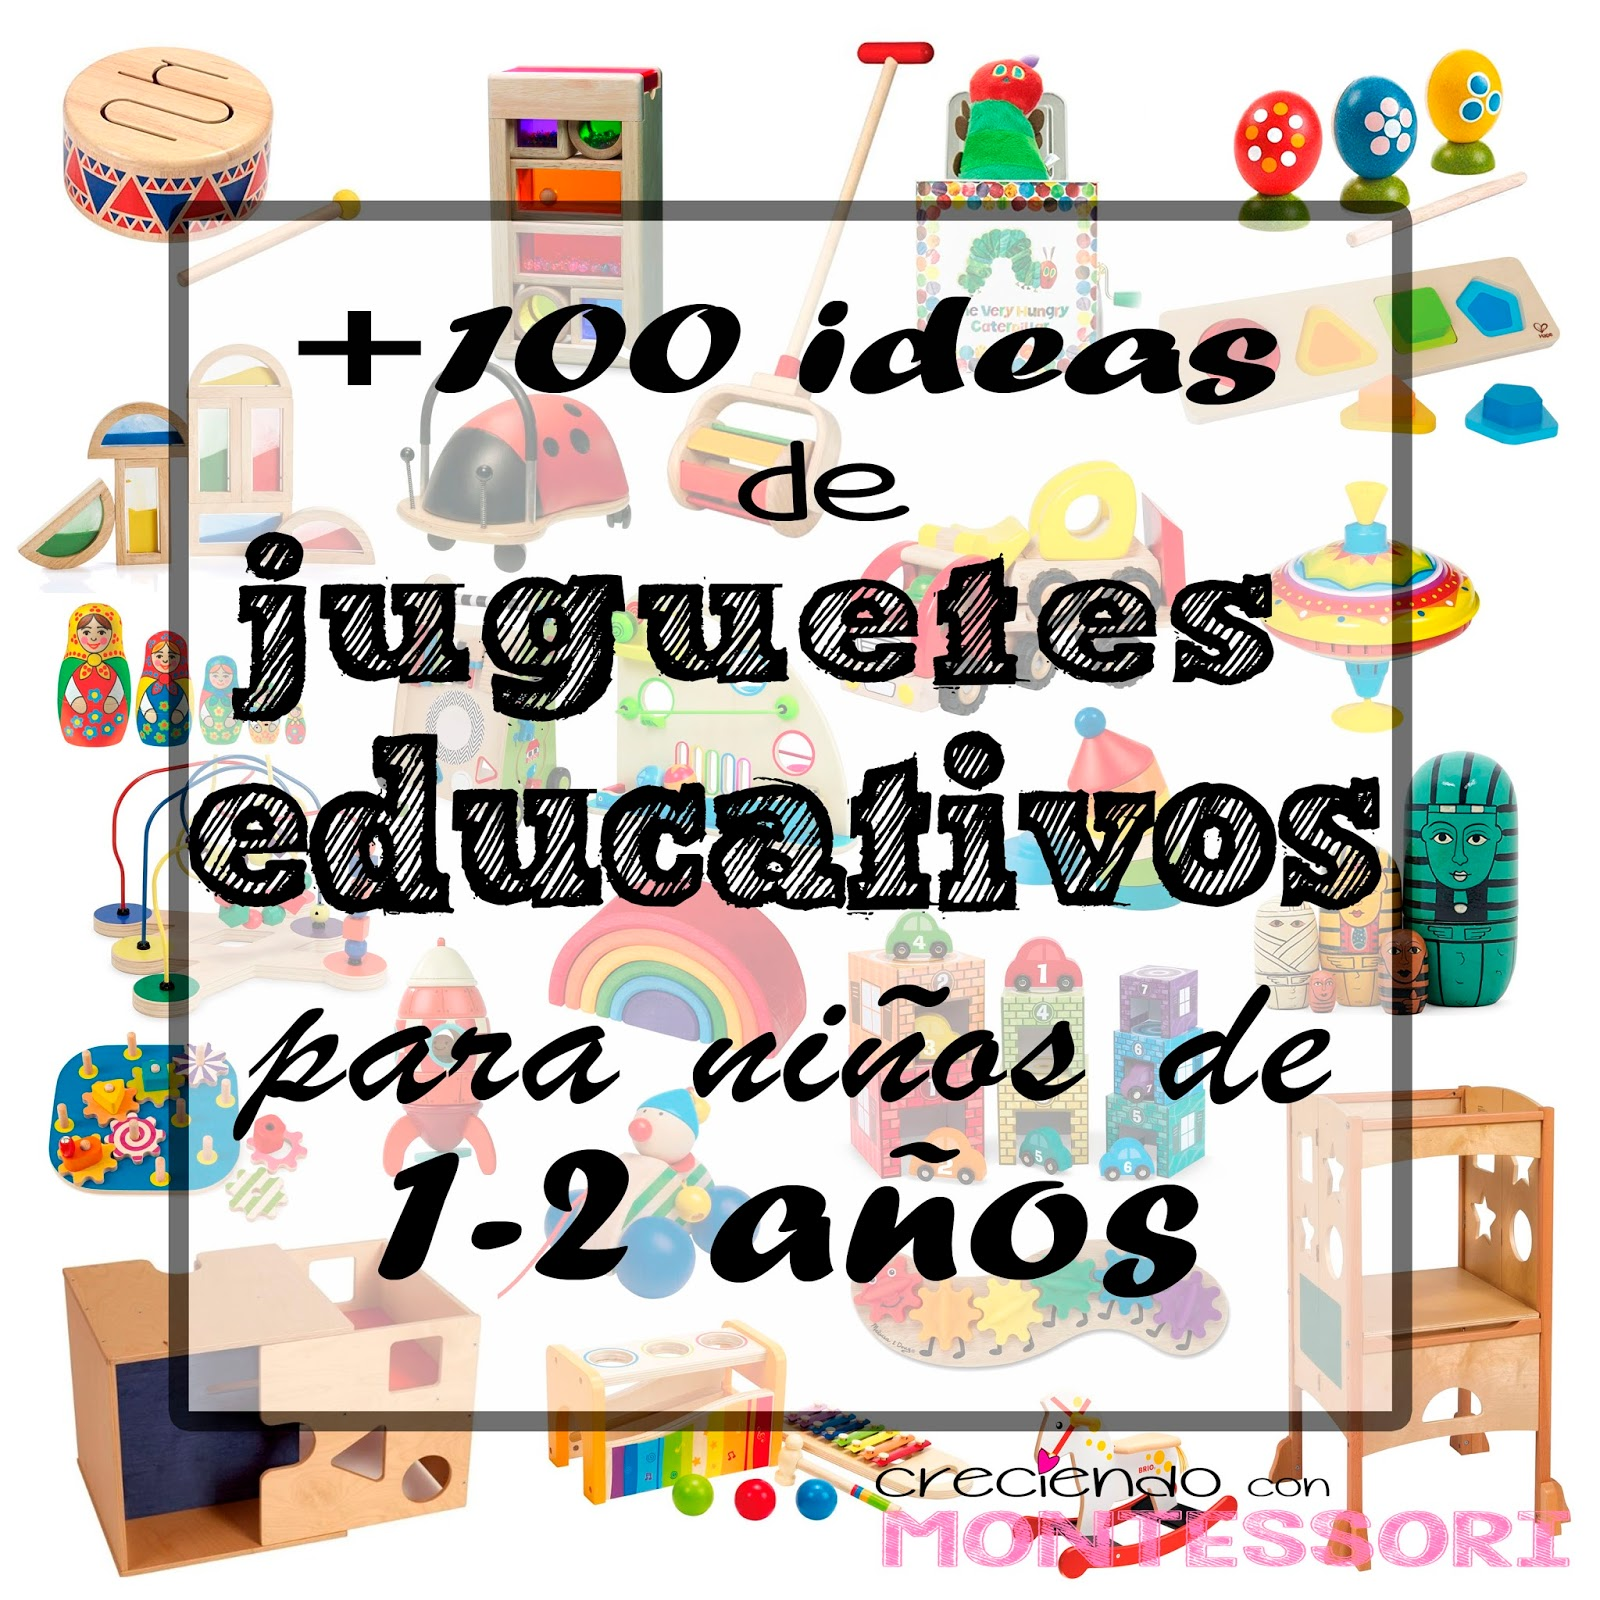 Mas De 100 Ideas De Juguetes Educativos Para Ninos De 1 2 Anos